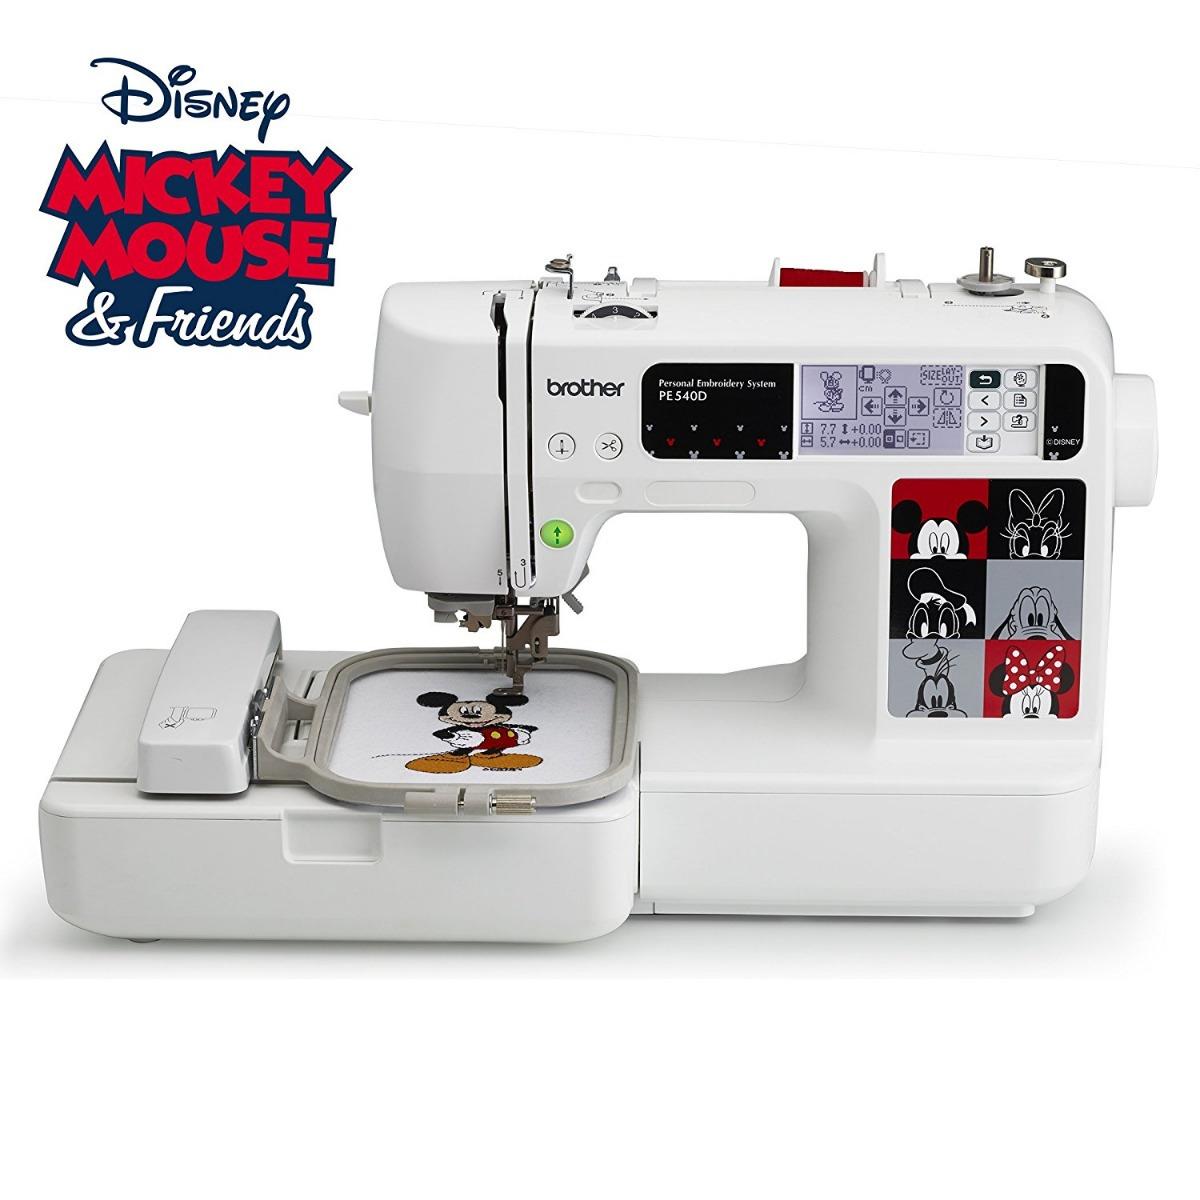 Máquina Bordado Brother Pe540d 4x4 35 diseños De Disney - $ 1.798 ...